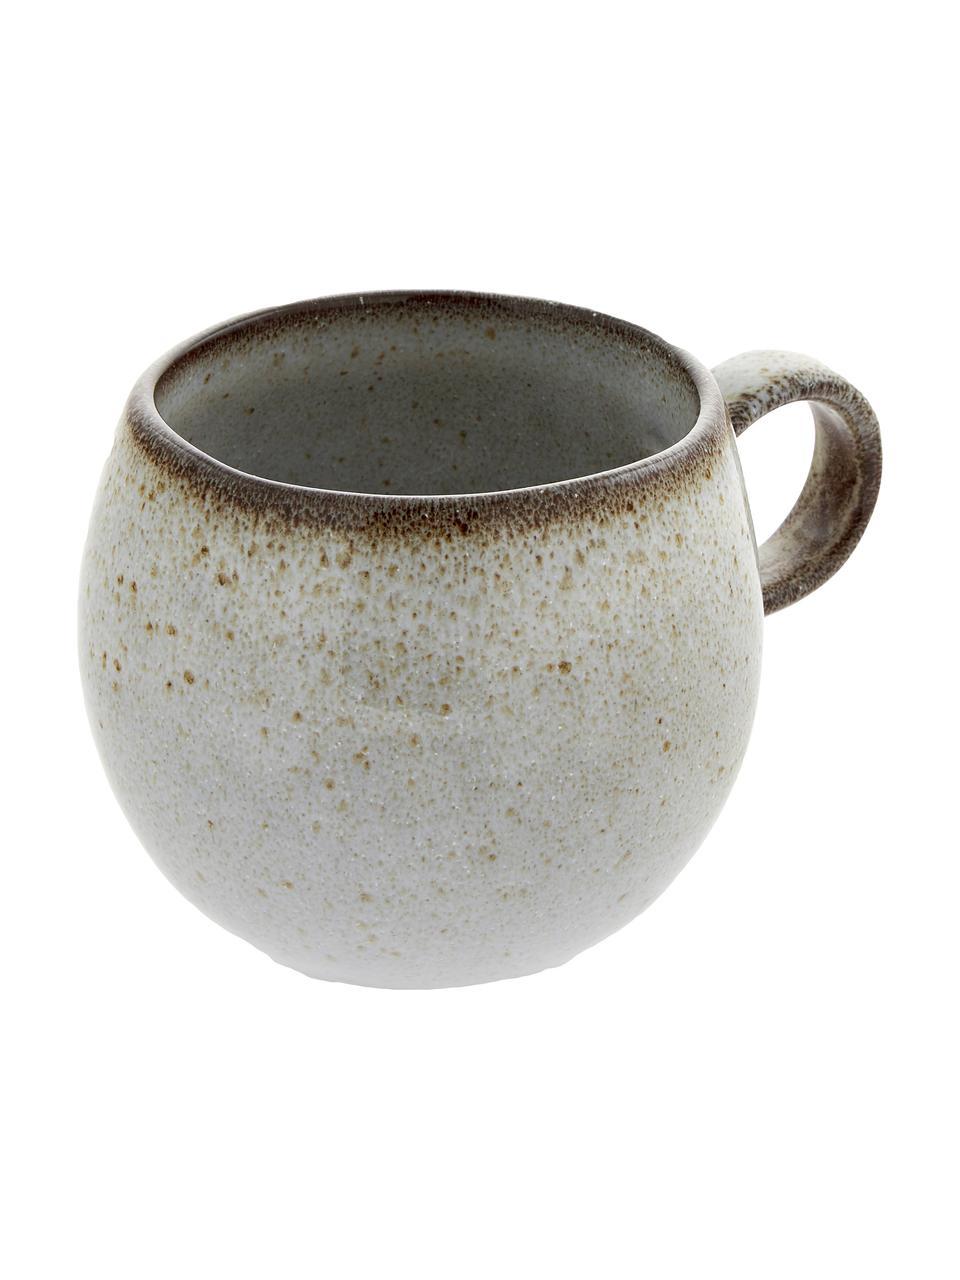 Tasse artisanale Sandrine, Tons beiges